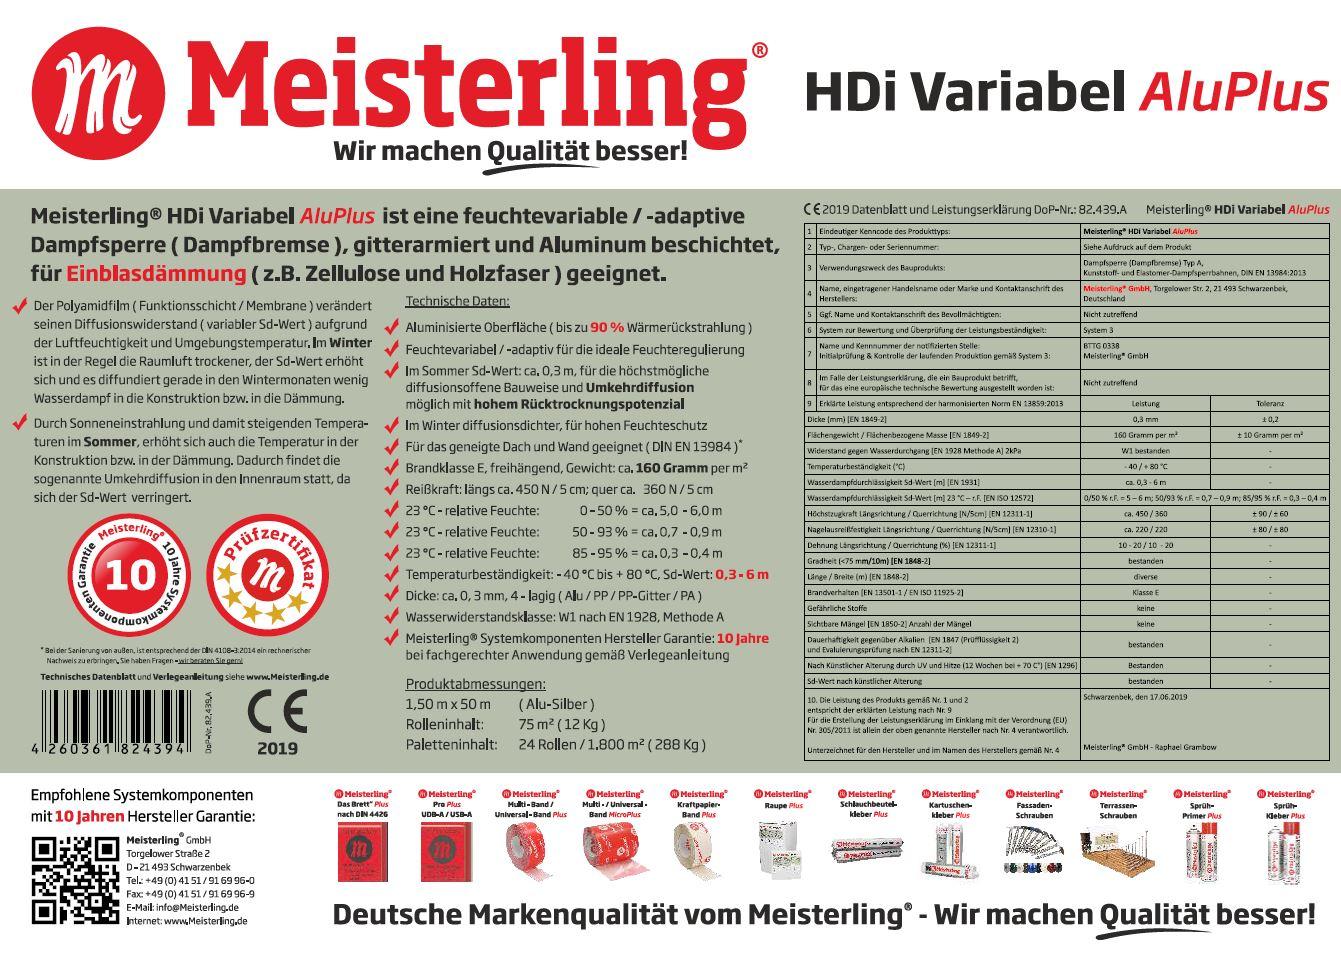 Meisterling® HDi Variabel Alu PLUS Technische Daten